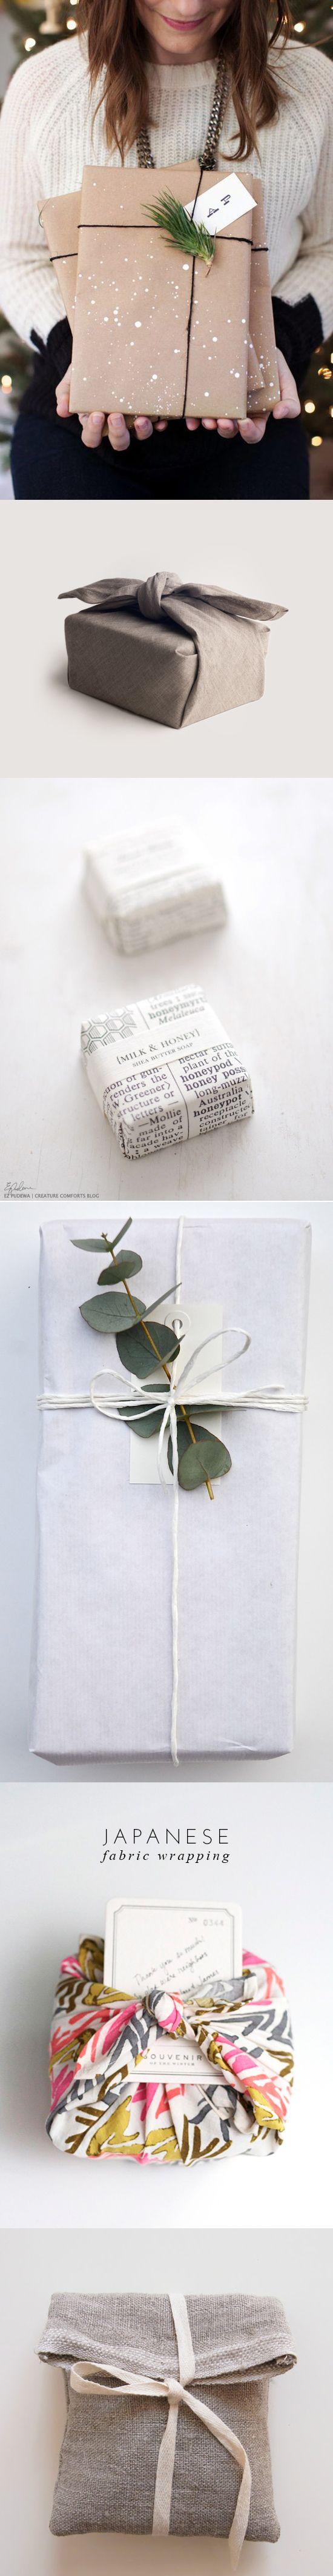 ★ #xmas #newyear #packaging ★